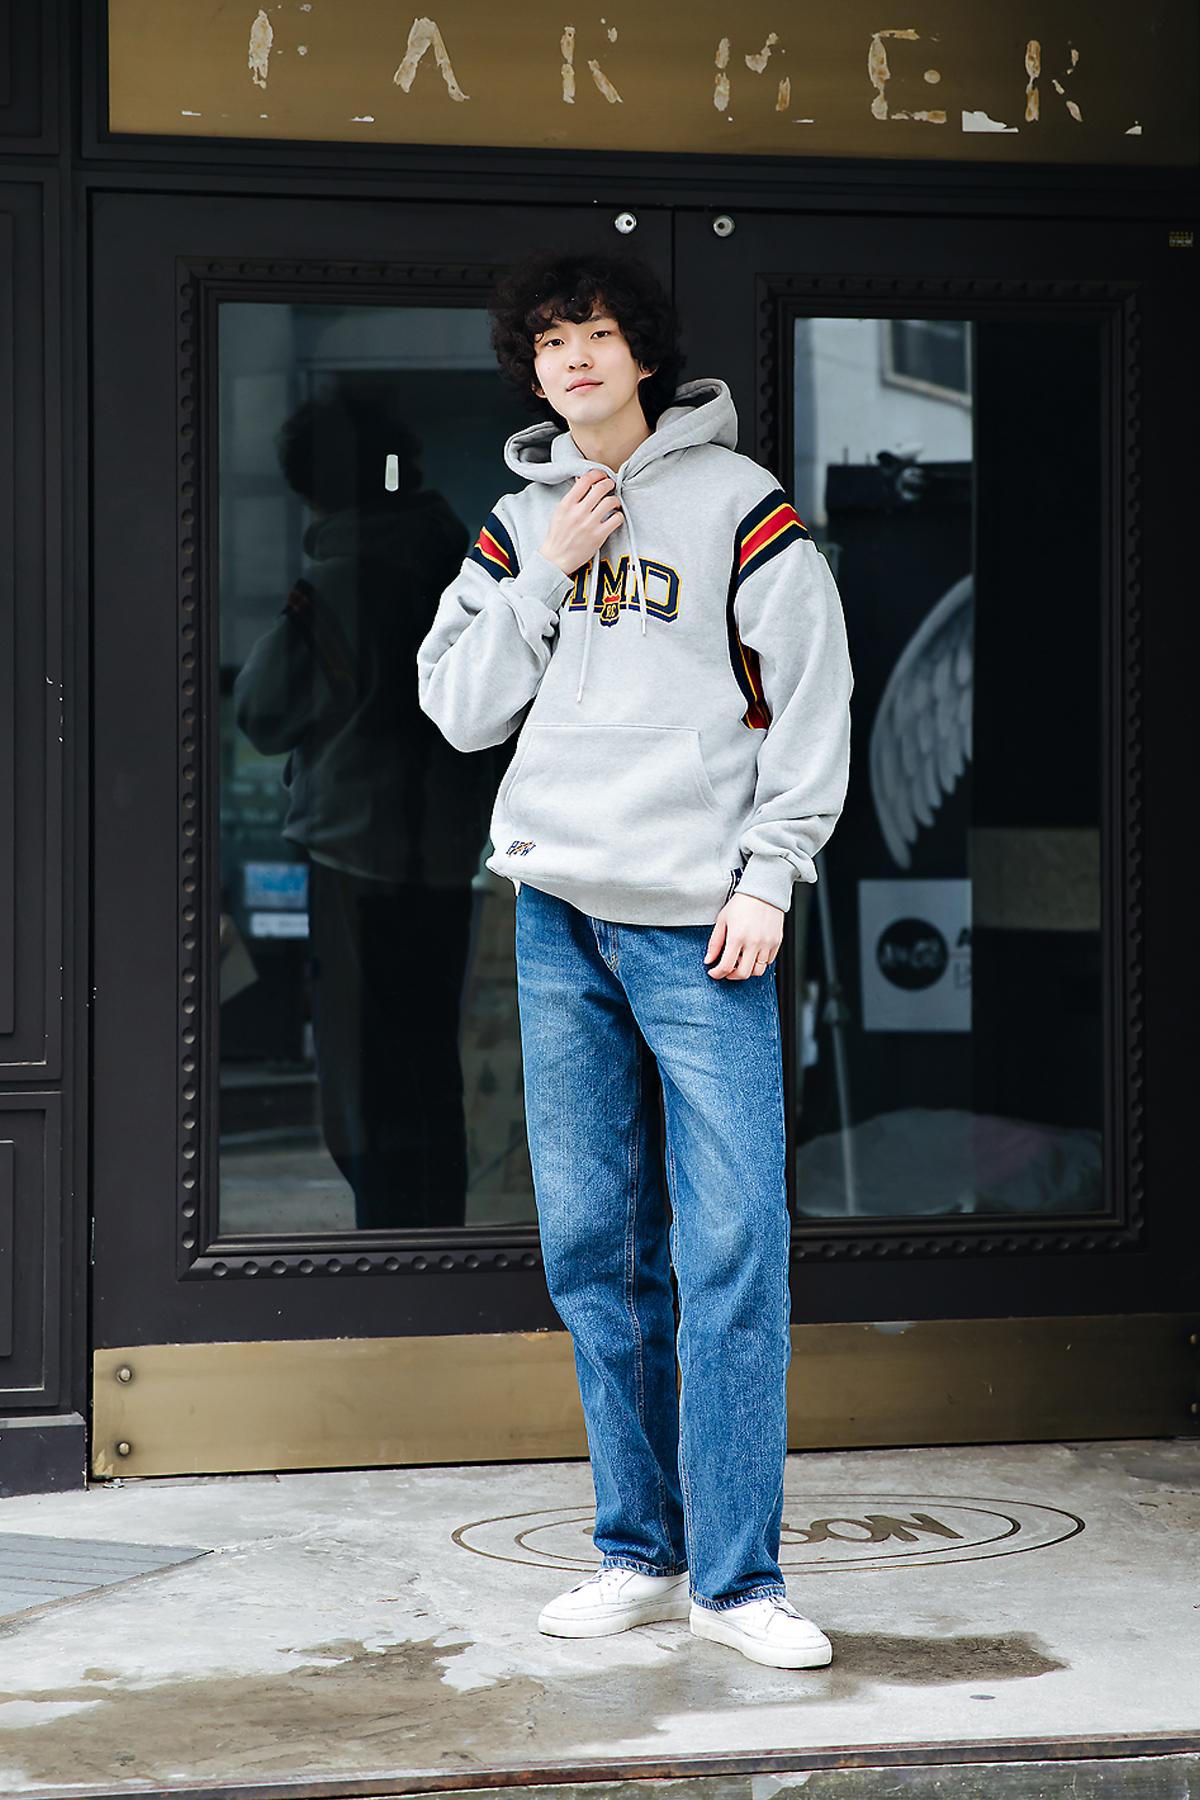 Street Fashion - 13